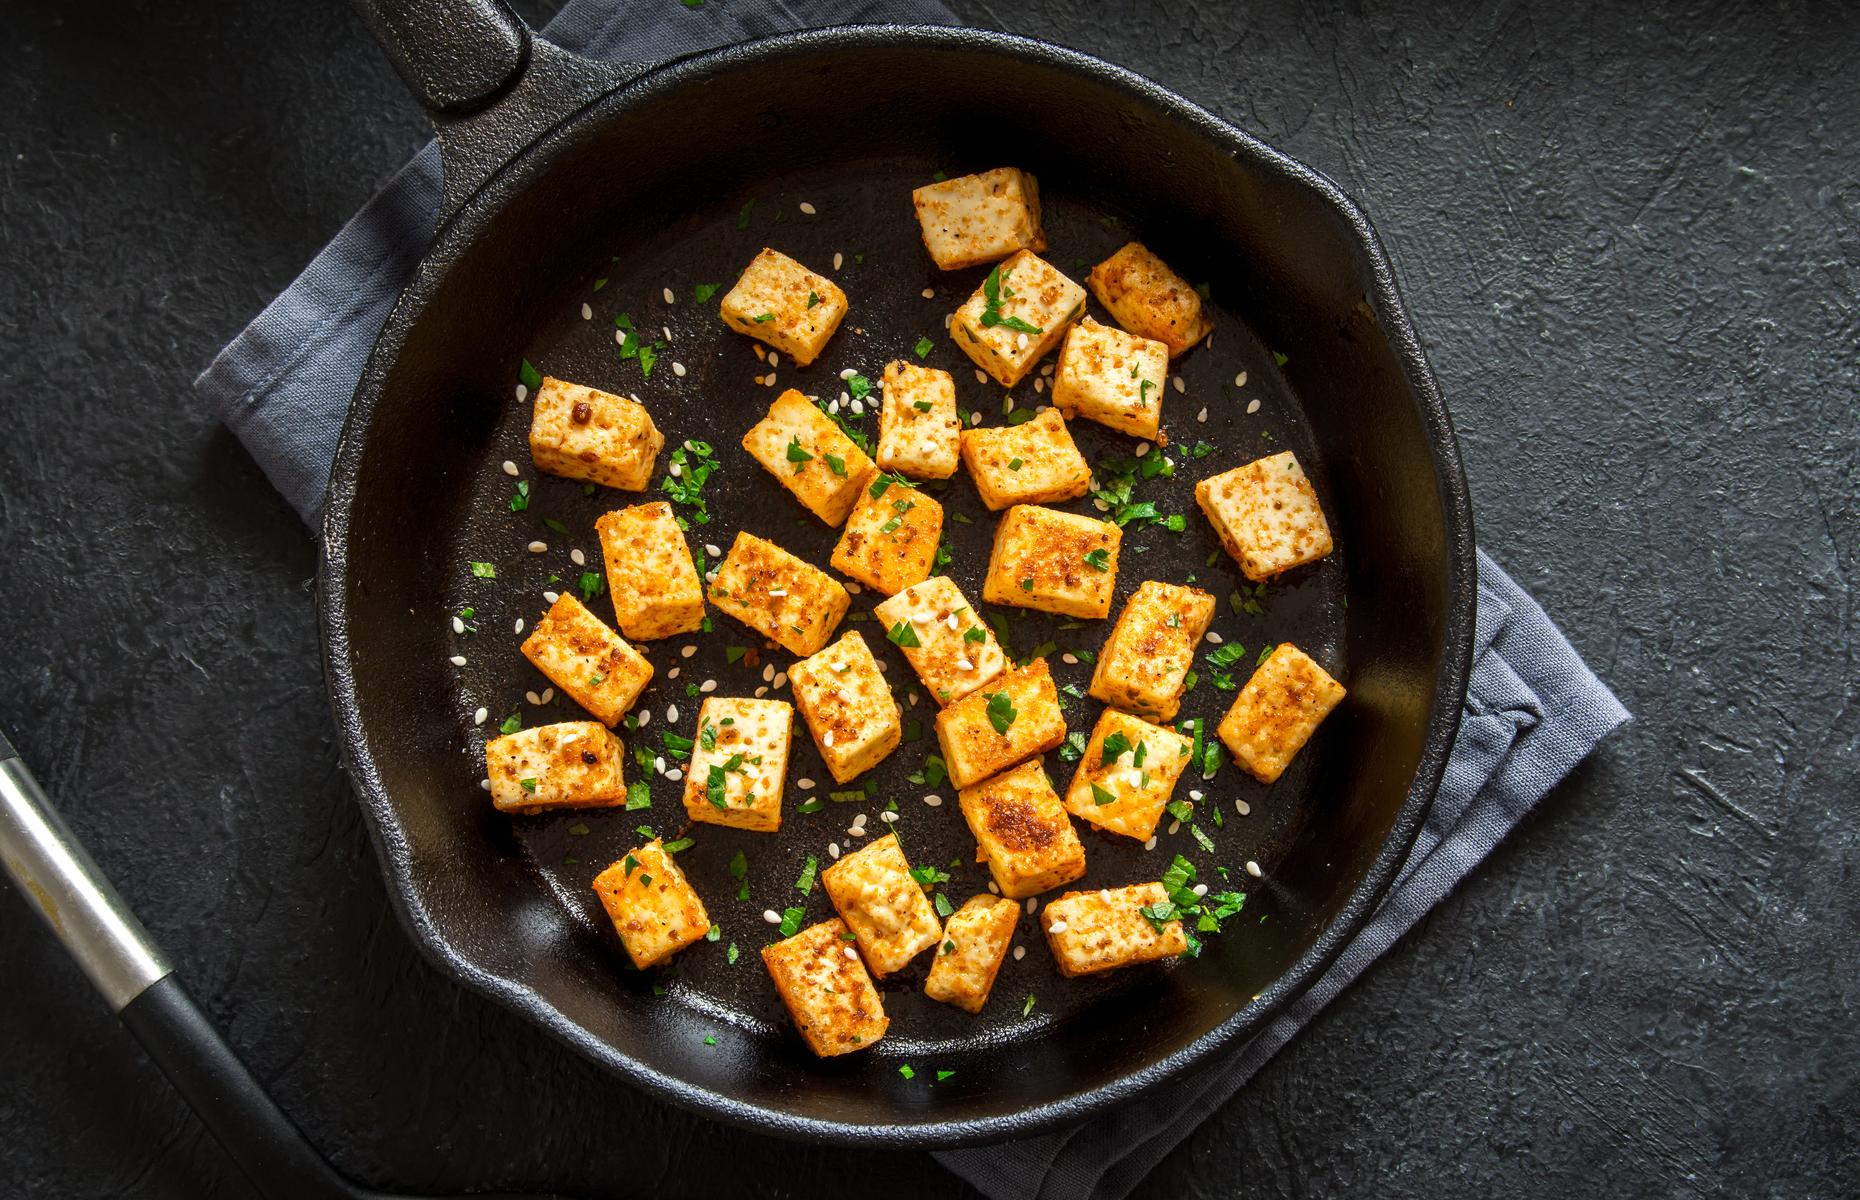 Stir-fried tofu (Image: Oksana Mizina/Shutterstock)